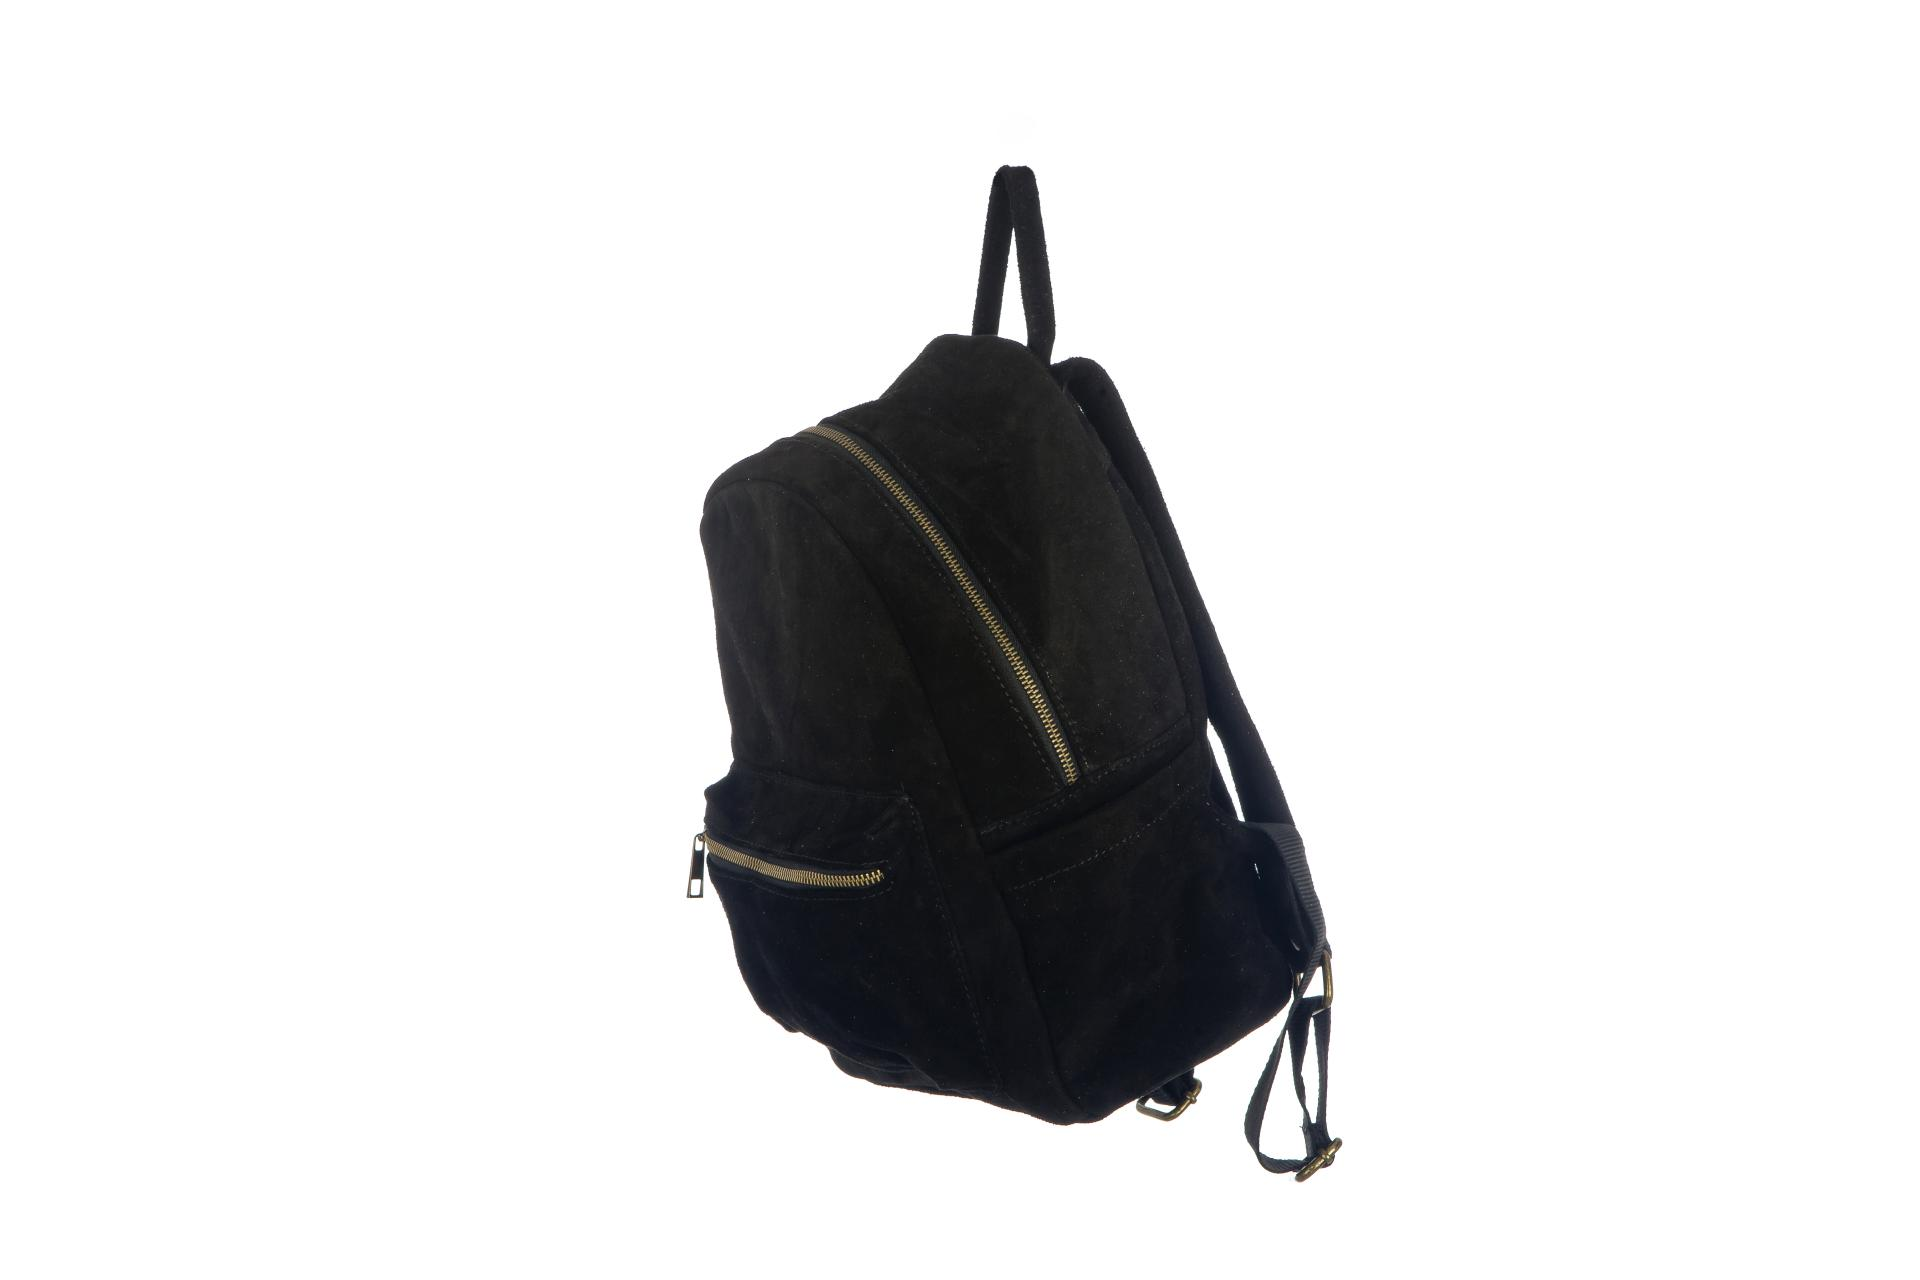 mochila ante negro 867.jpg